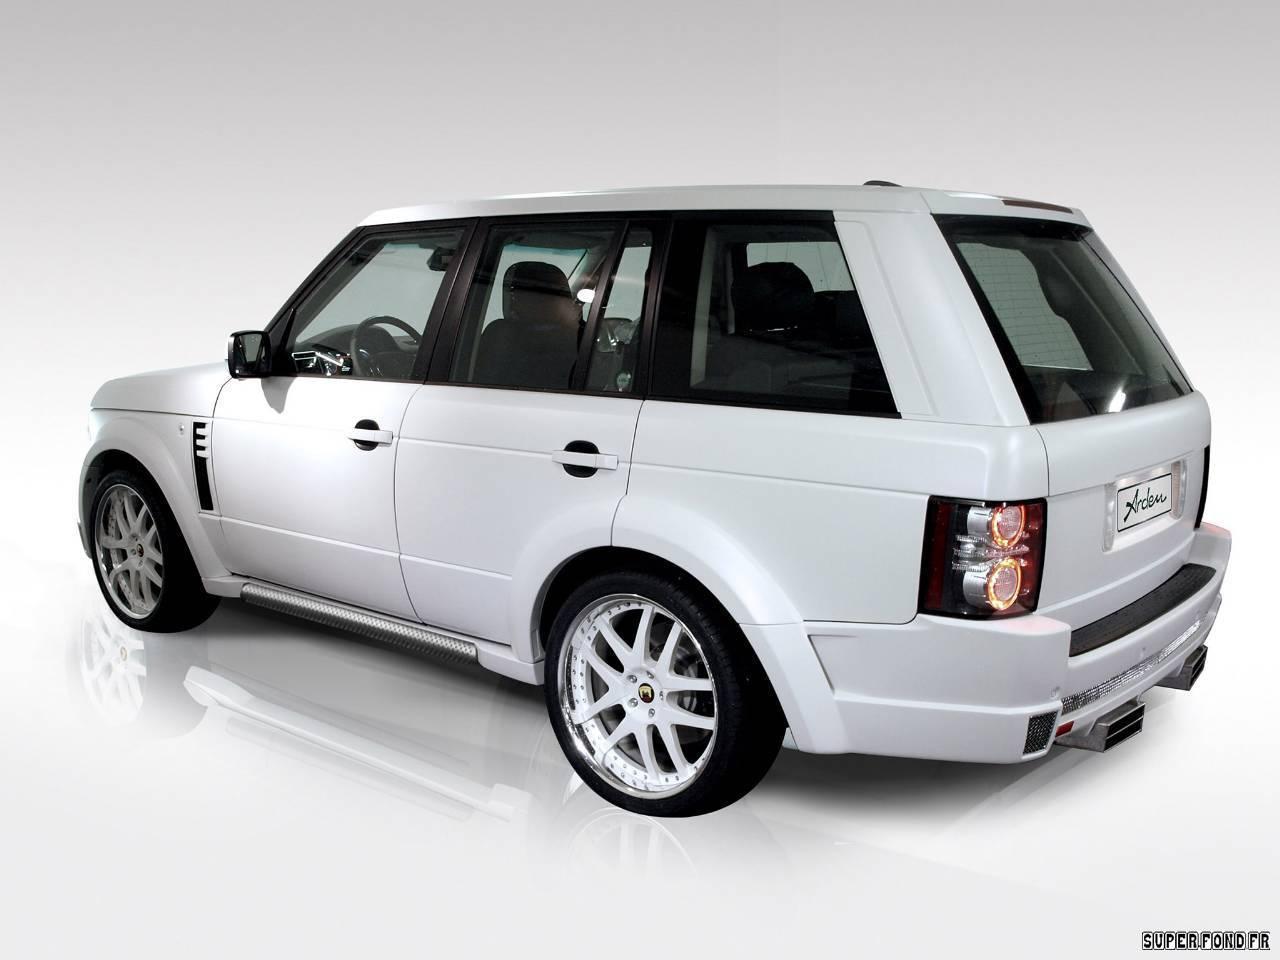 2011 Arden Range Rover AR7 Highlander